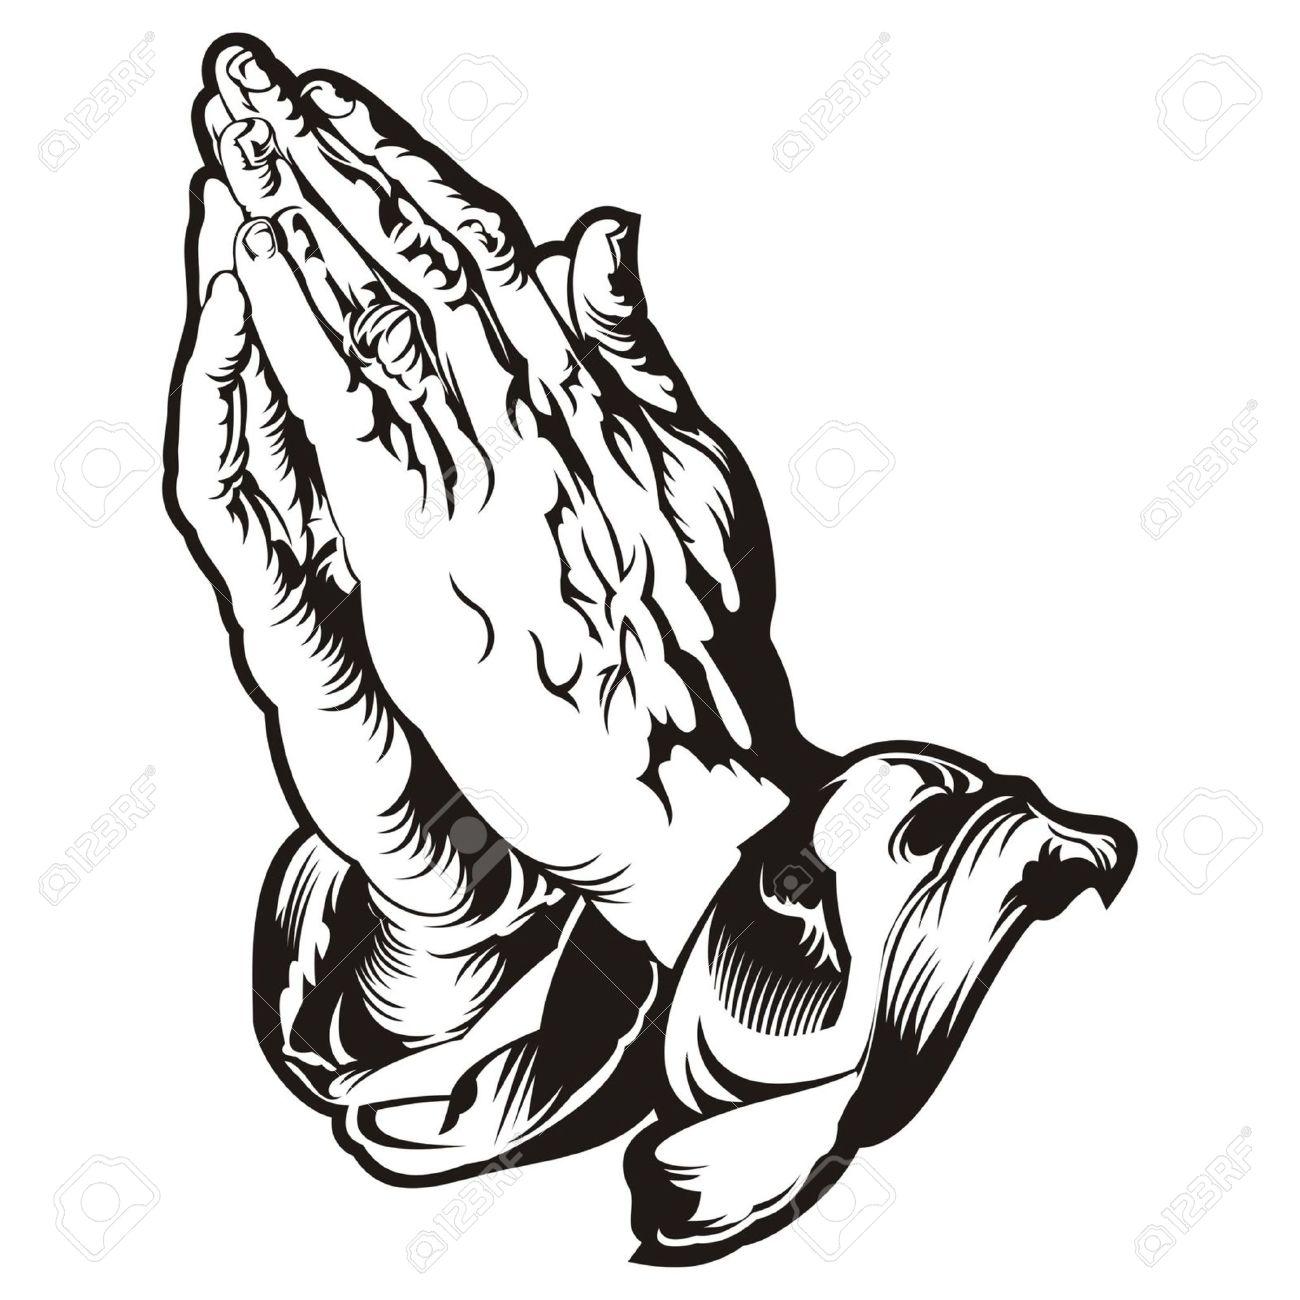 1300x1300 Praying Hands Tatto Vector Royalty Free Cliparts, Vectors,